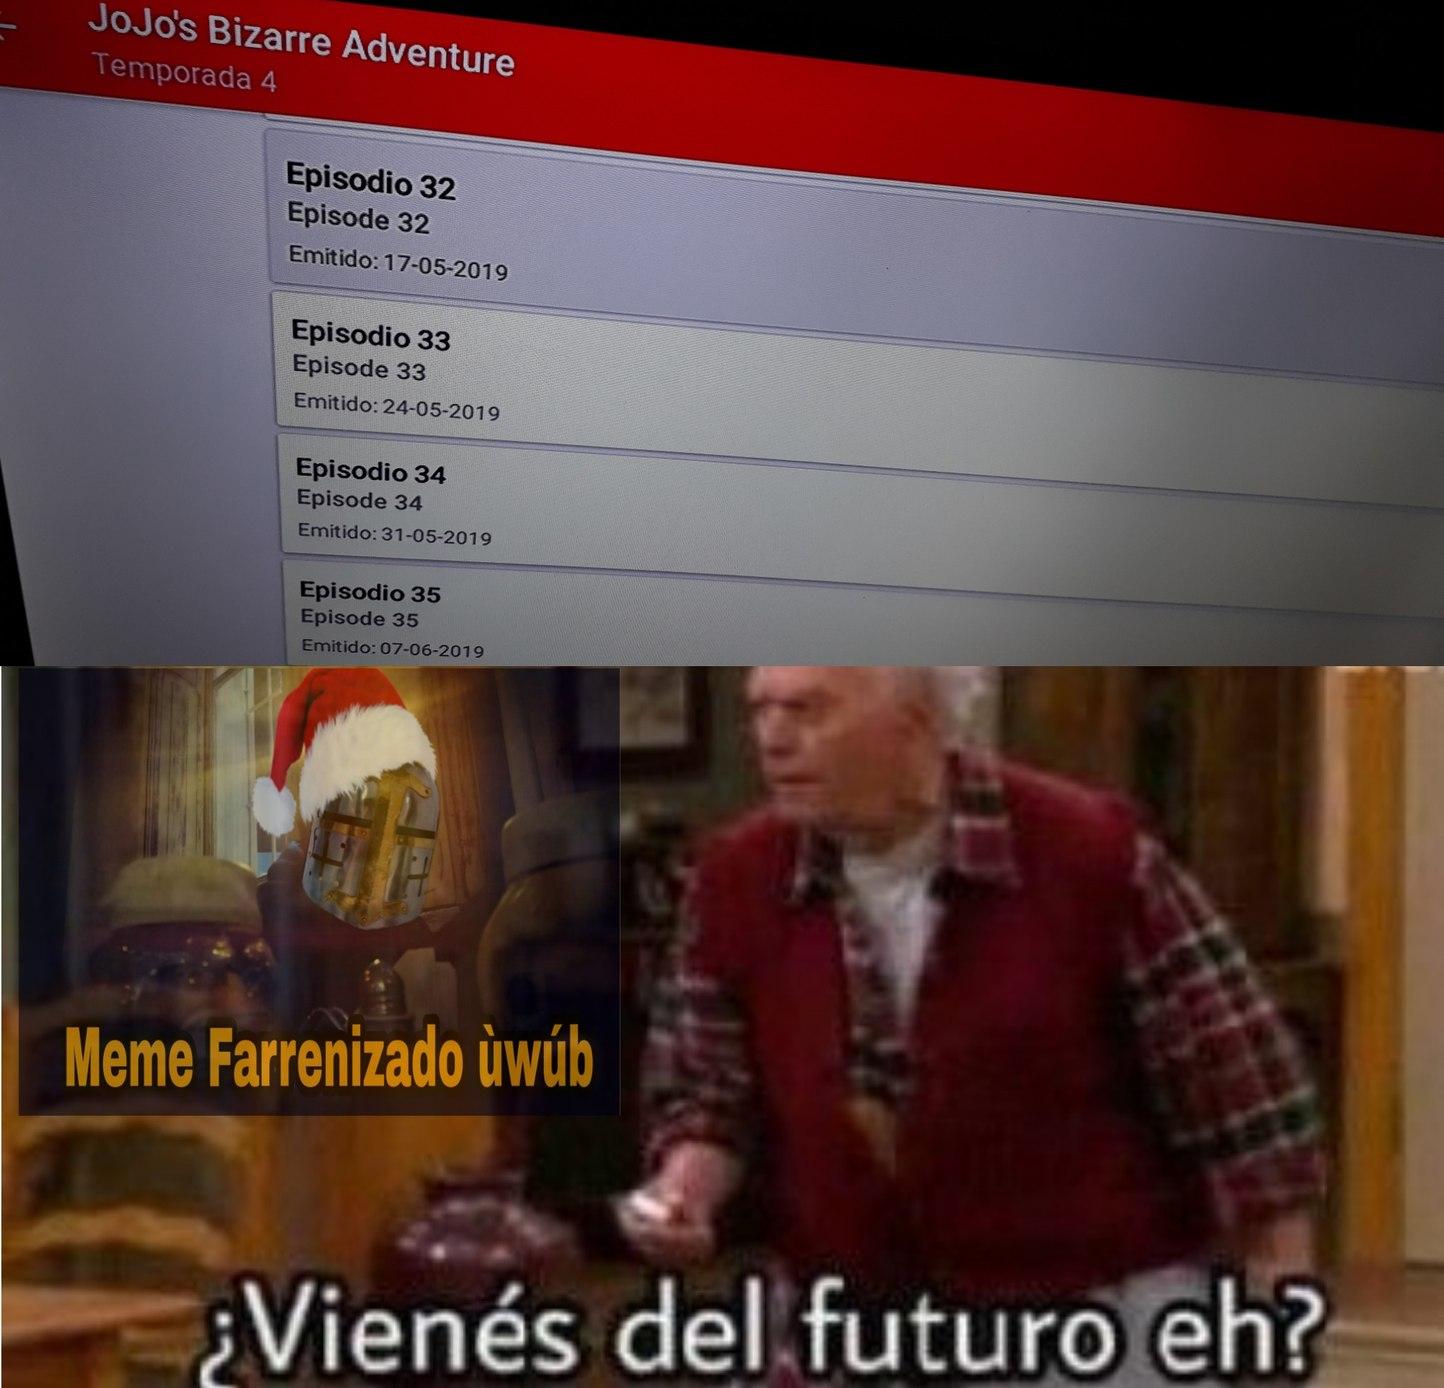 ALGO ANDA MAL - meme